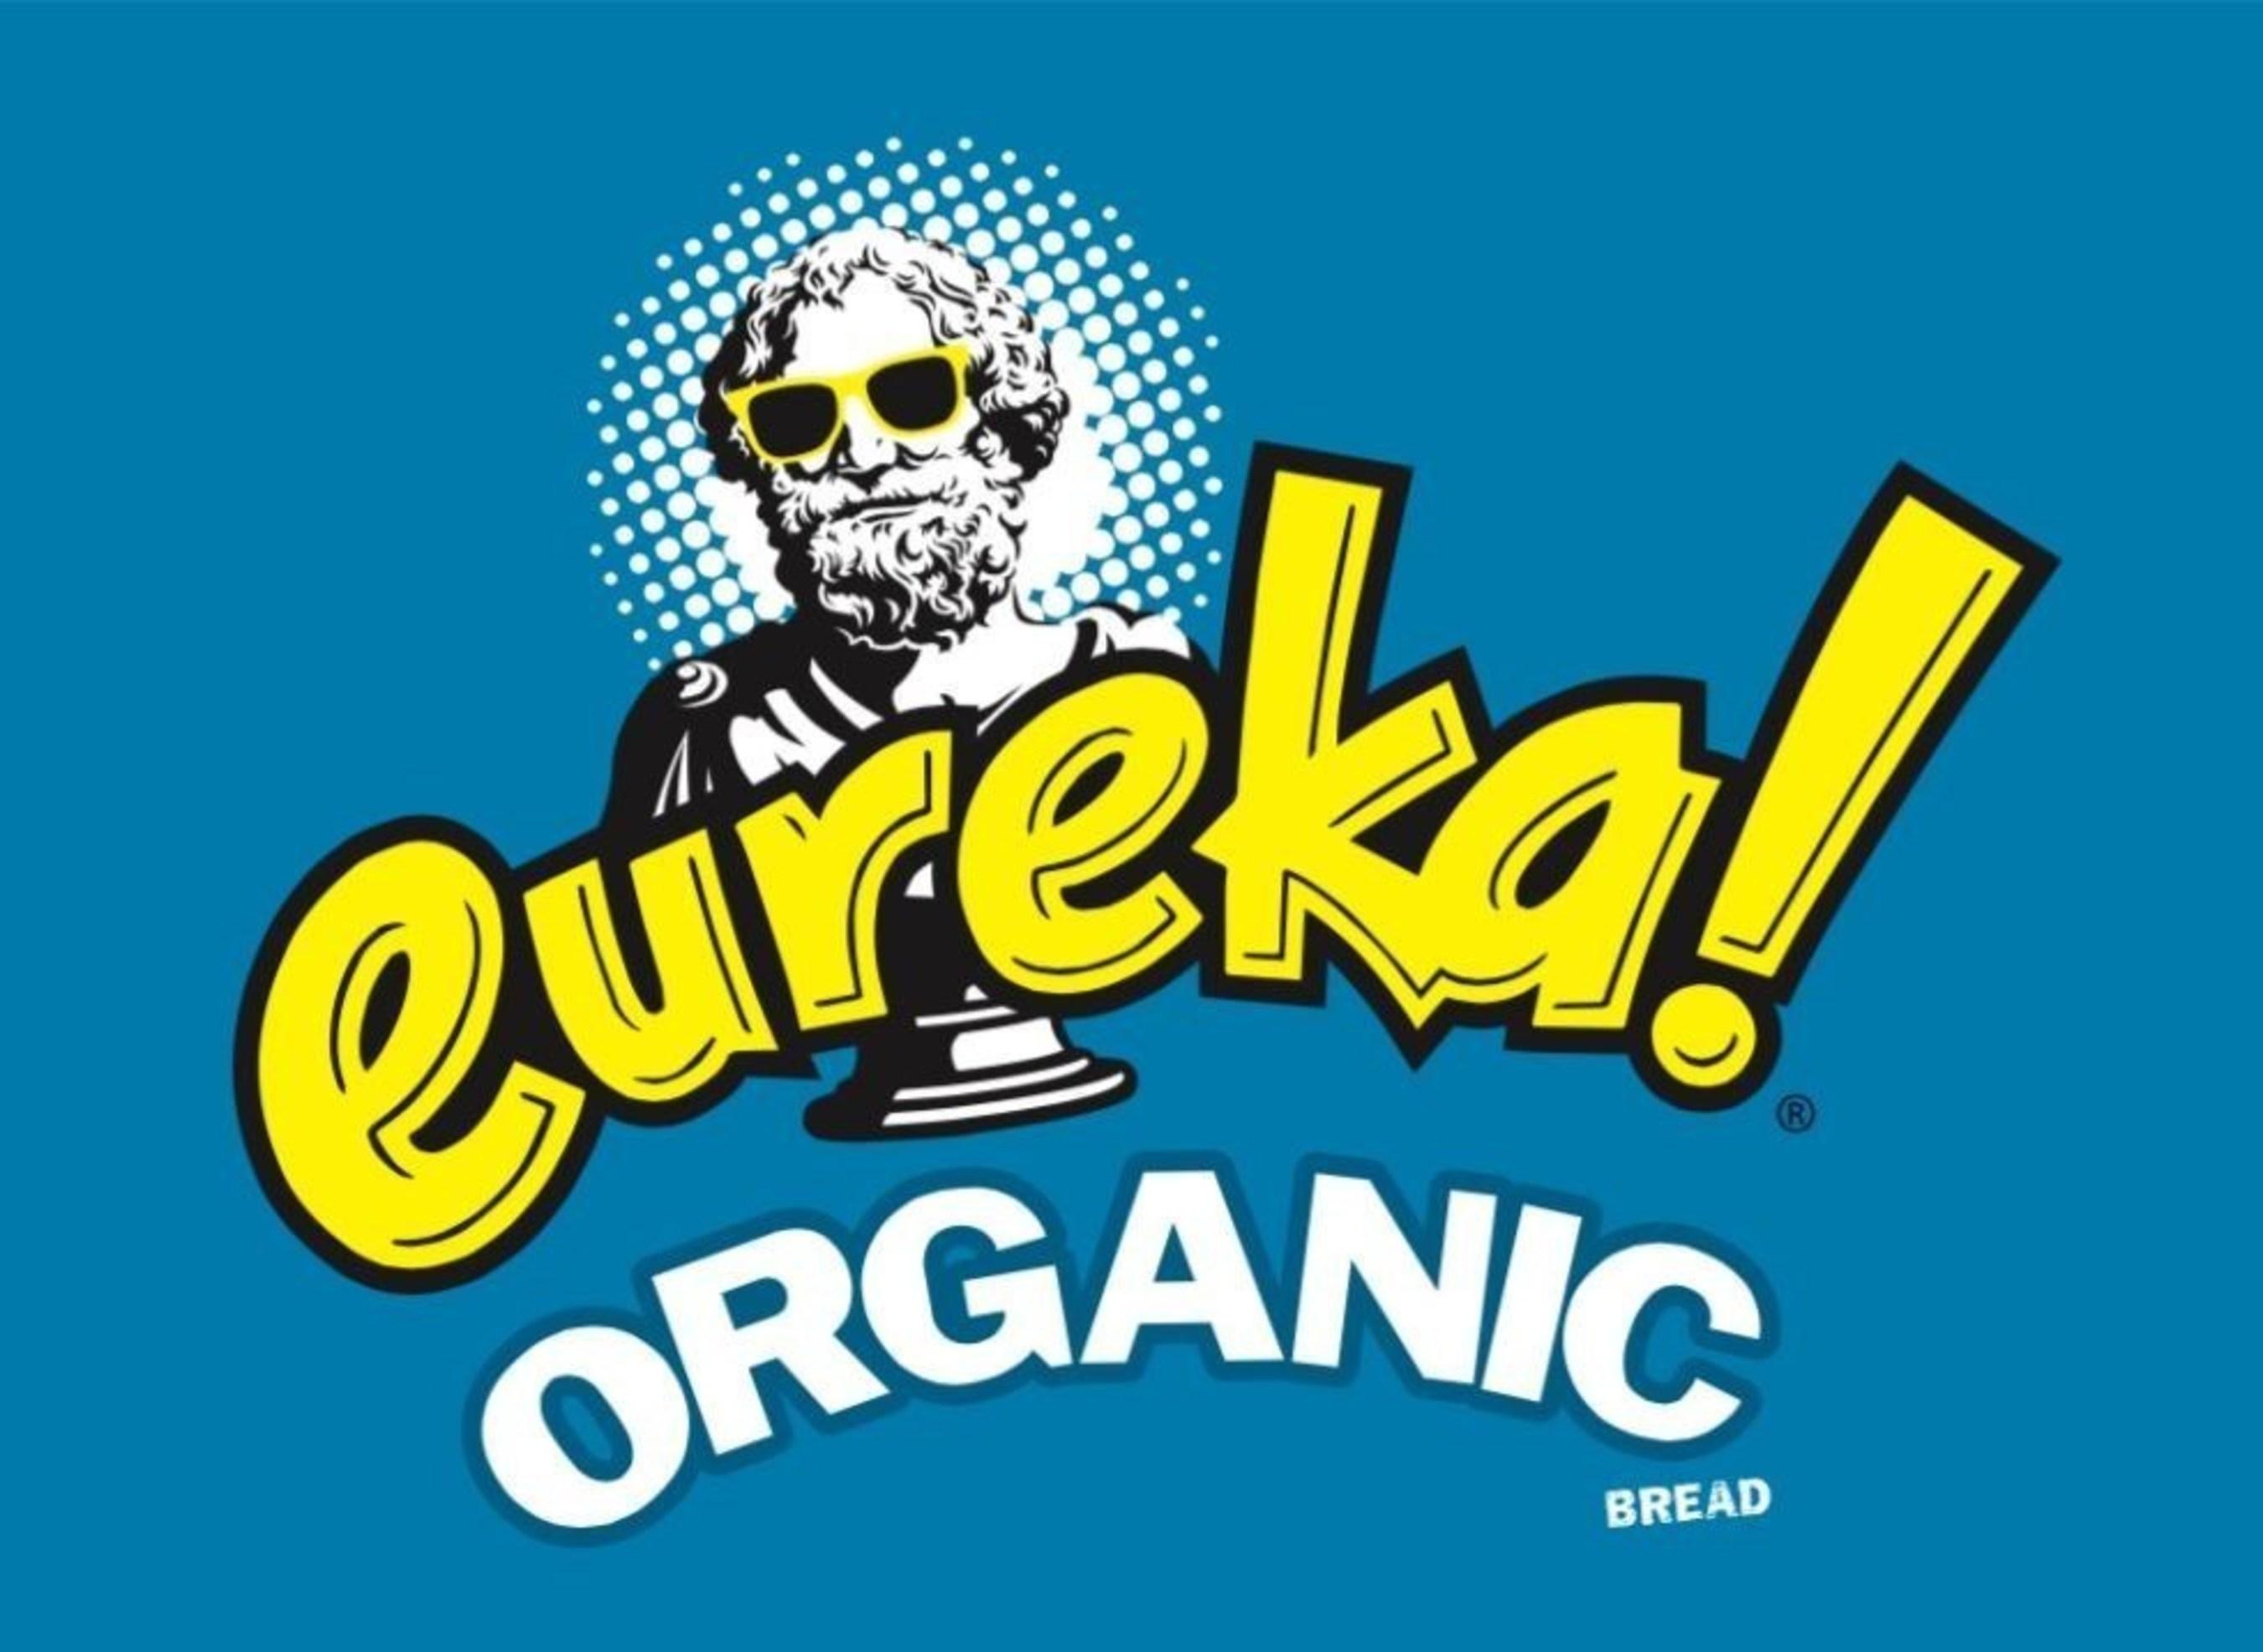 eureka! Organic Bread Logo